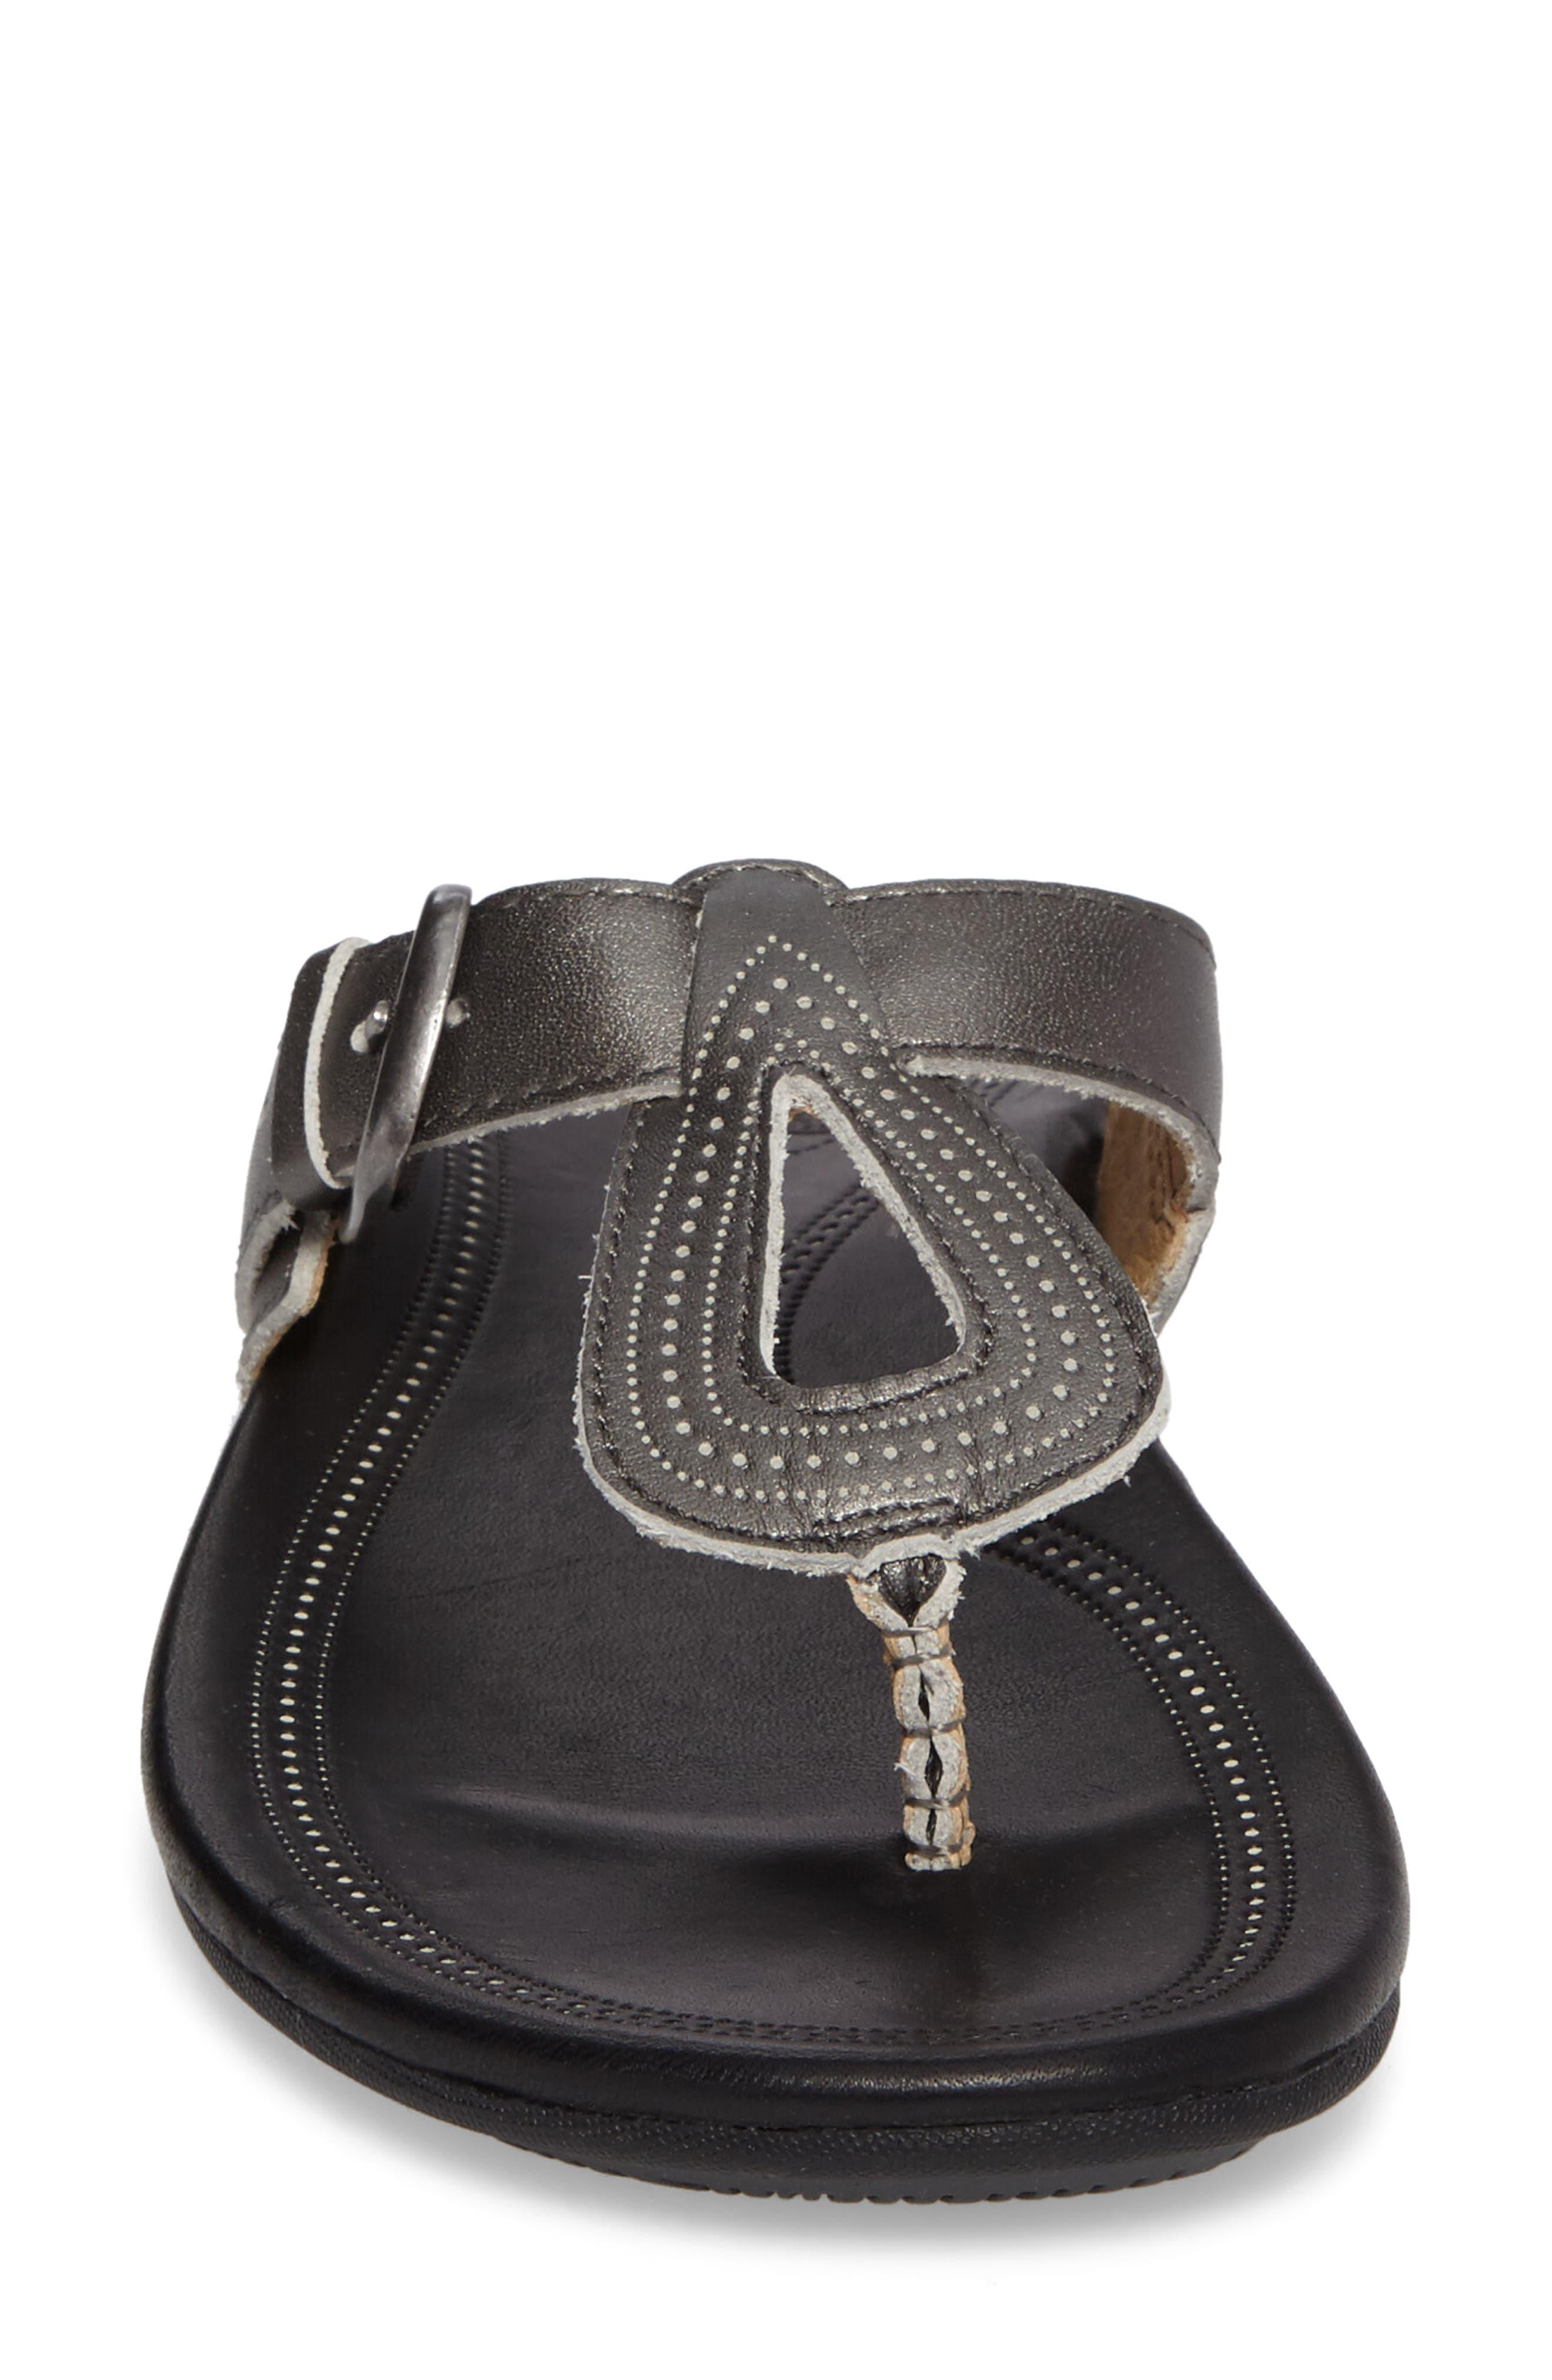 Lanakila Buckle Flip Flop Women),                             Alternate thumbnail 4, color,                             Pewter/ Black Leather